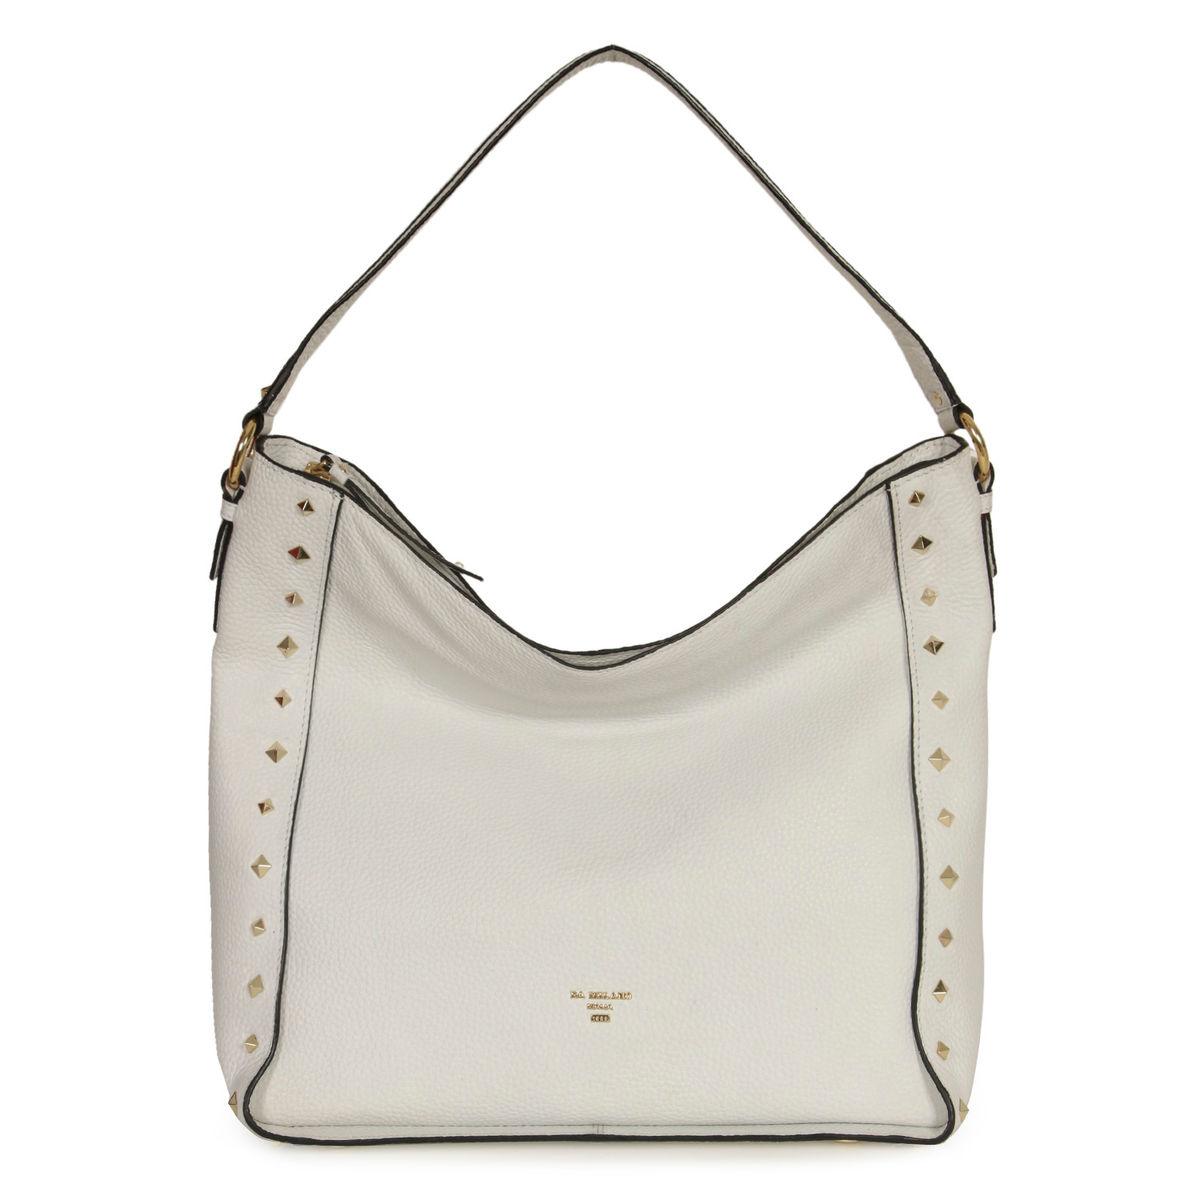 59873acf89 ... Da Milano White Long Handle Bag · zoom ...